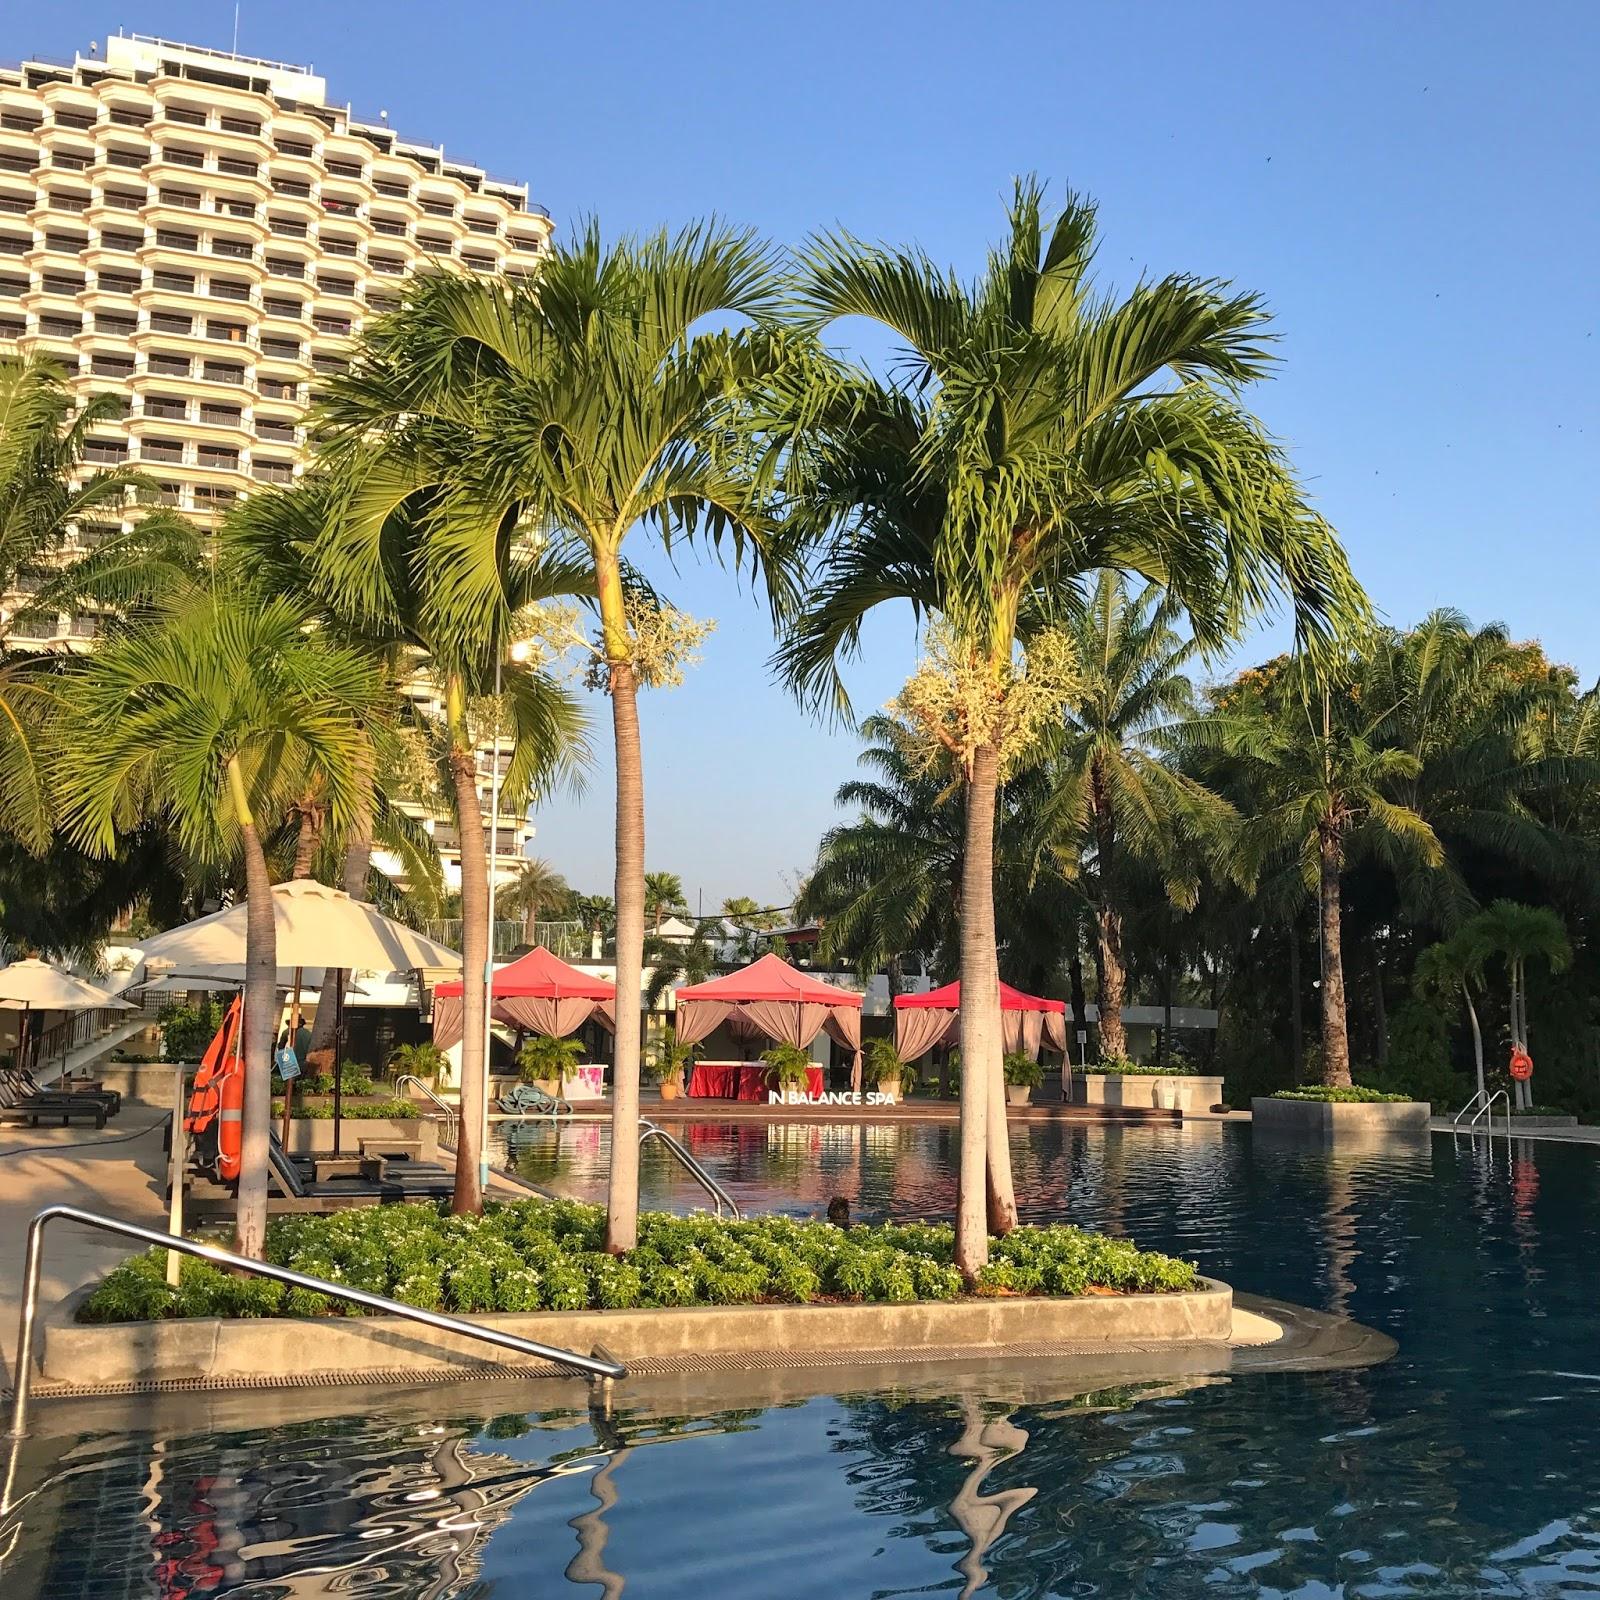 2017 hua hin trip day 4 oce u blog for Terrace 90 hua hin